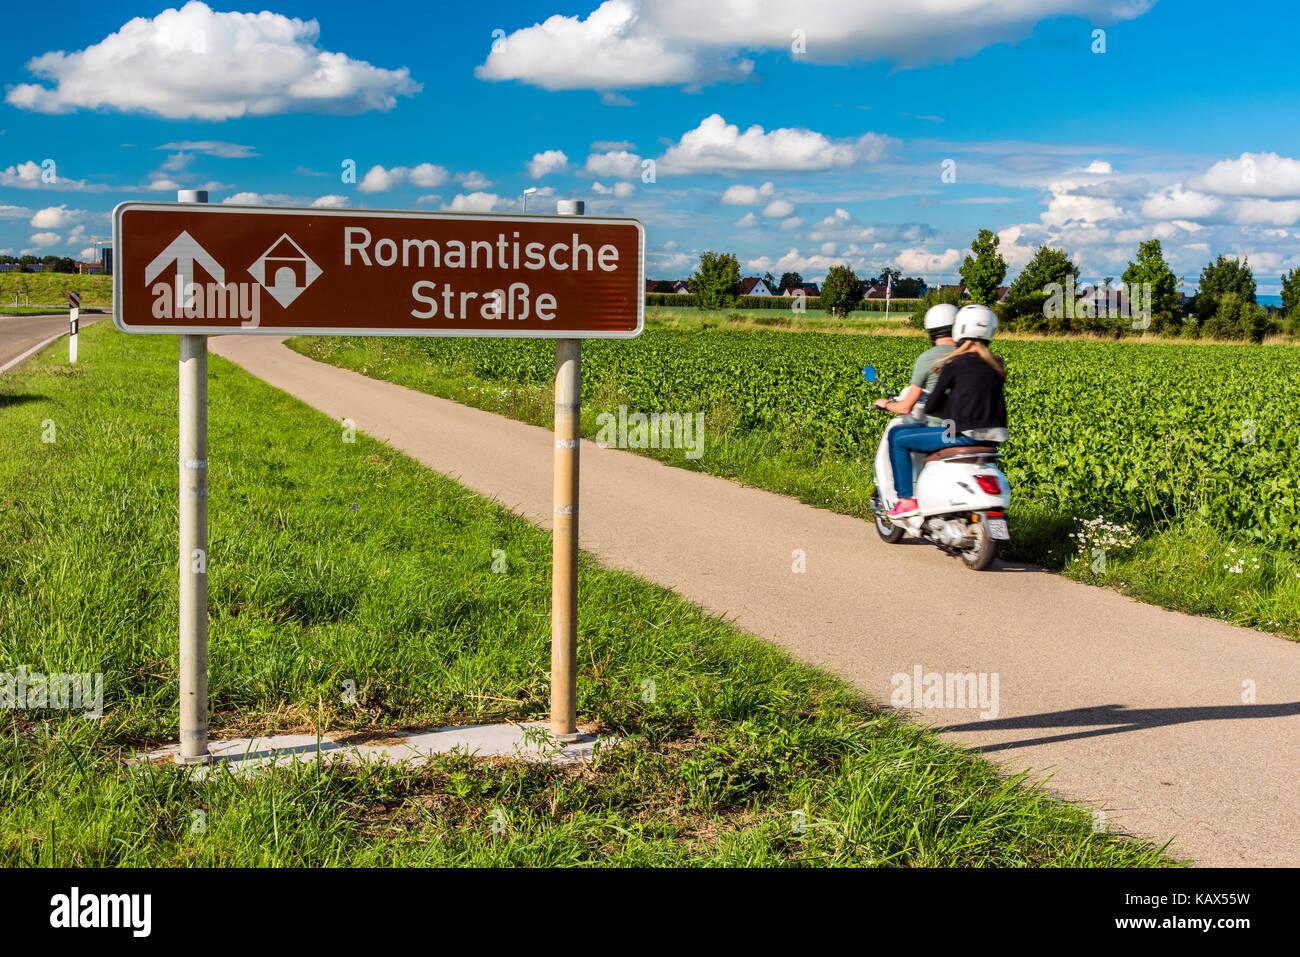 Car passing near a Romantische Strasse (Romantic Road) road sign, Nordlingen, Bavaria, Germany - Stock Image